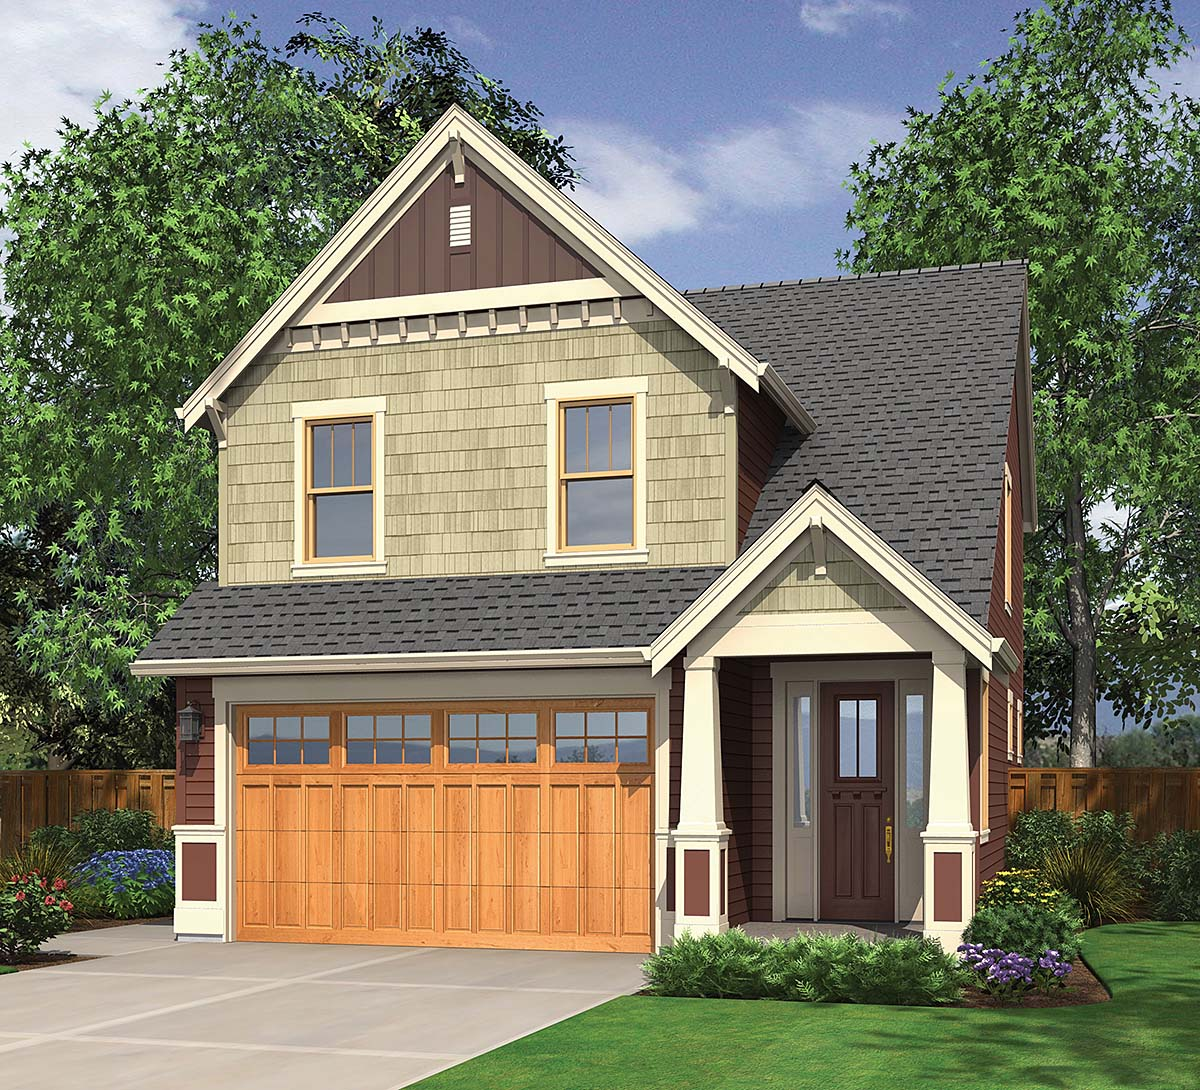 Bungalow, Craftsman House Plan 81281 with 3 Beds, 3 Baths, 2 Car Garage Elevation